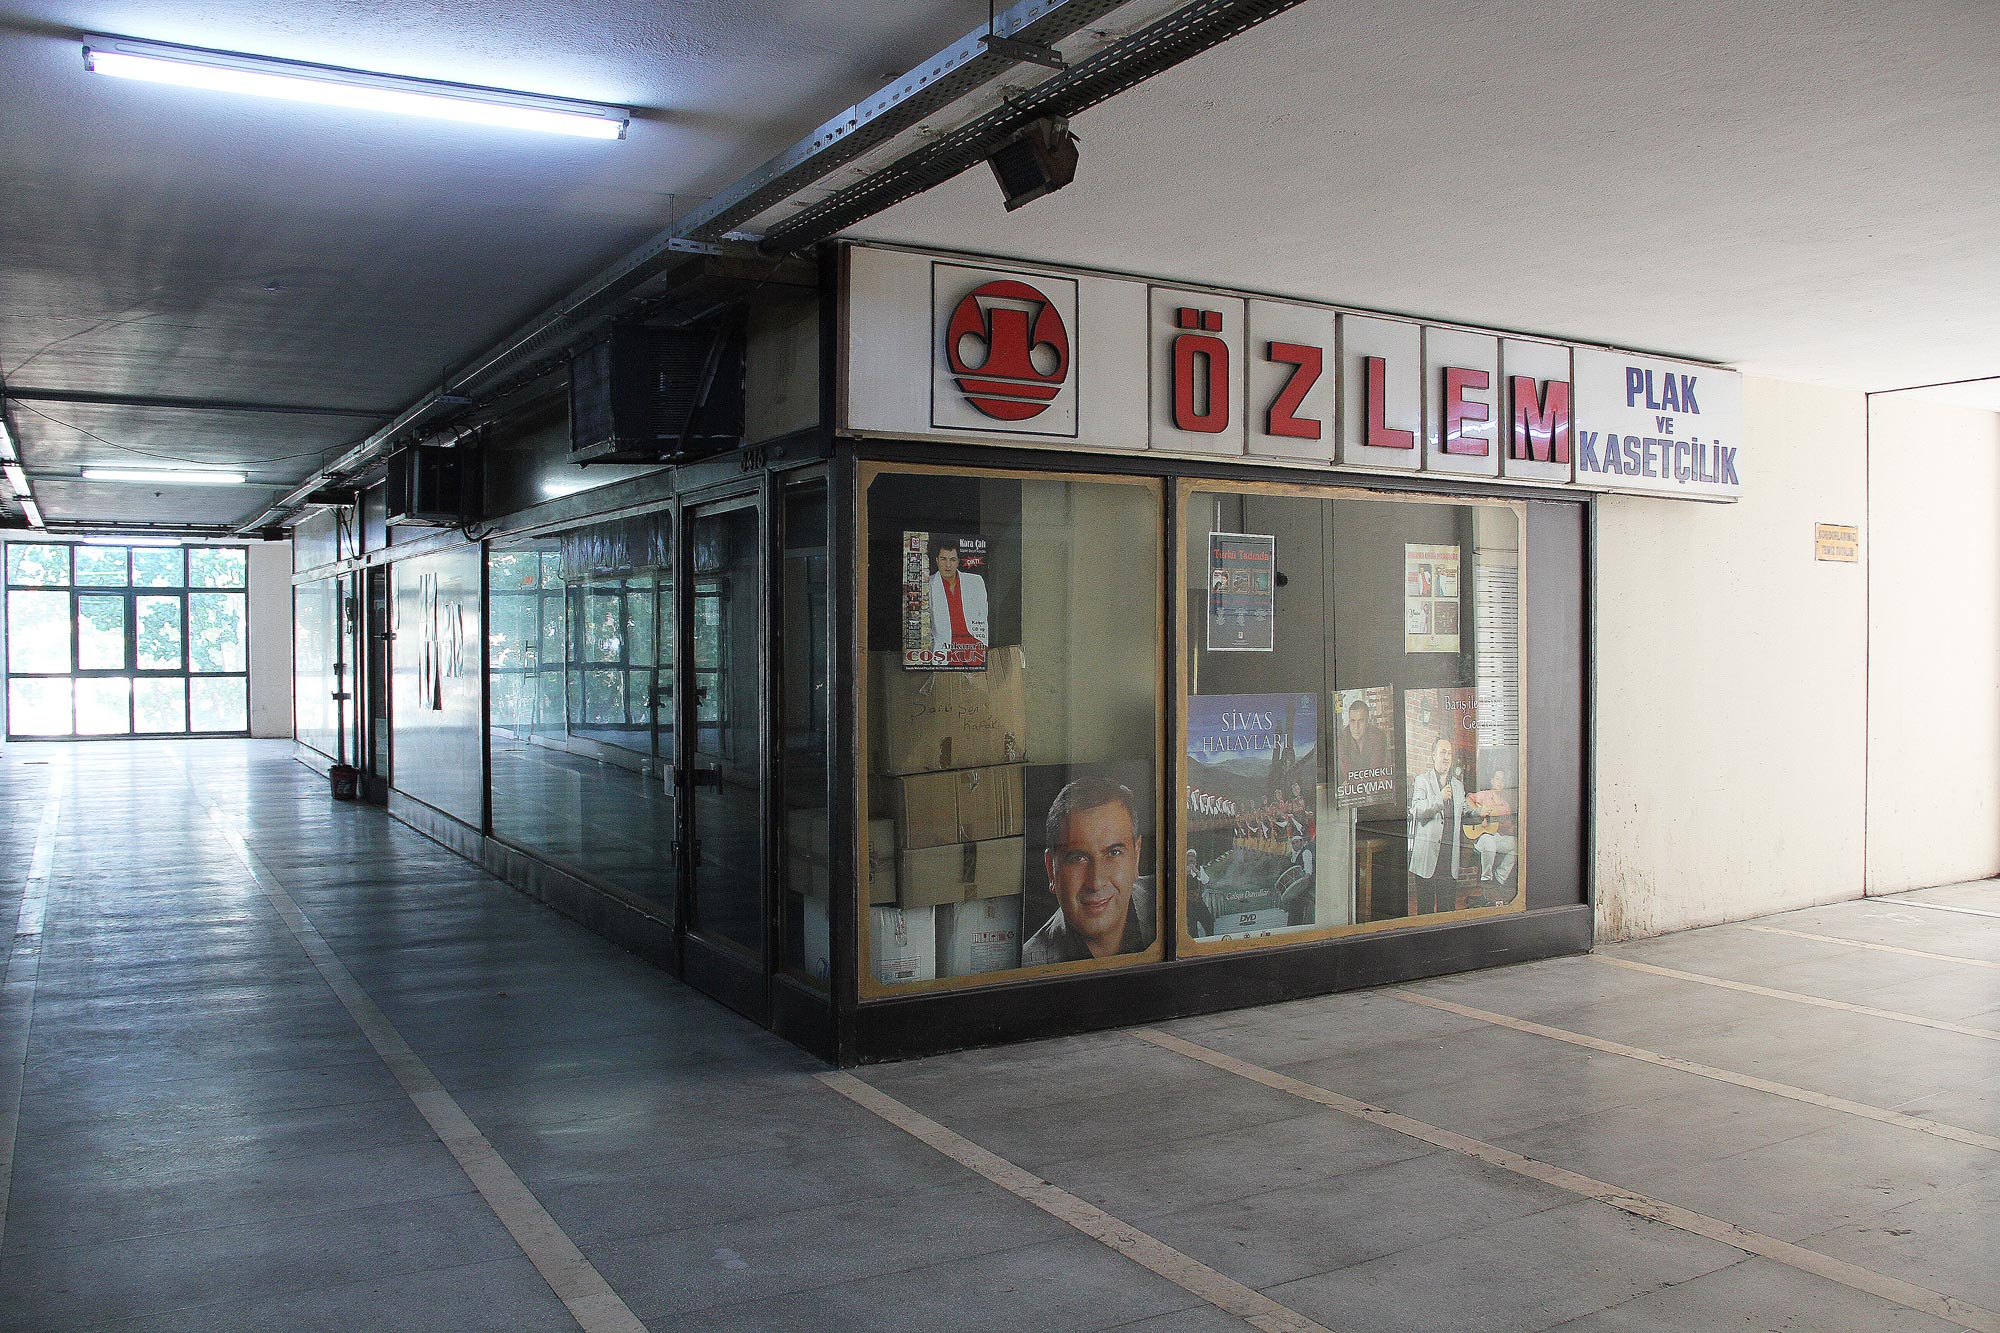 Record shops, İstanbul Manifaturacılar Çarşısi, Istanbul